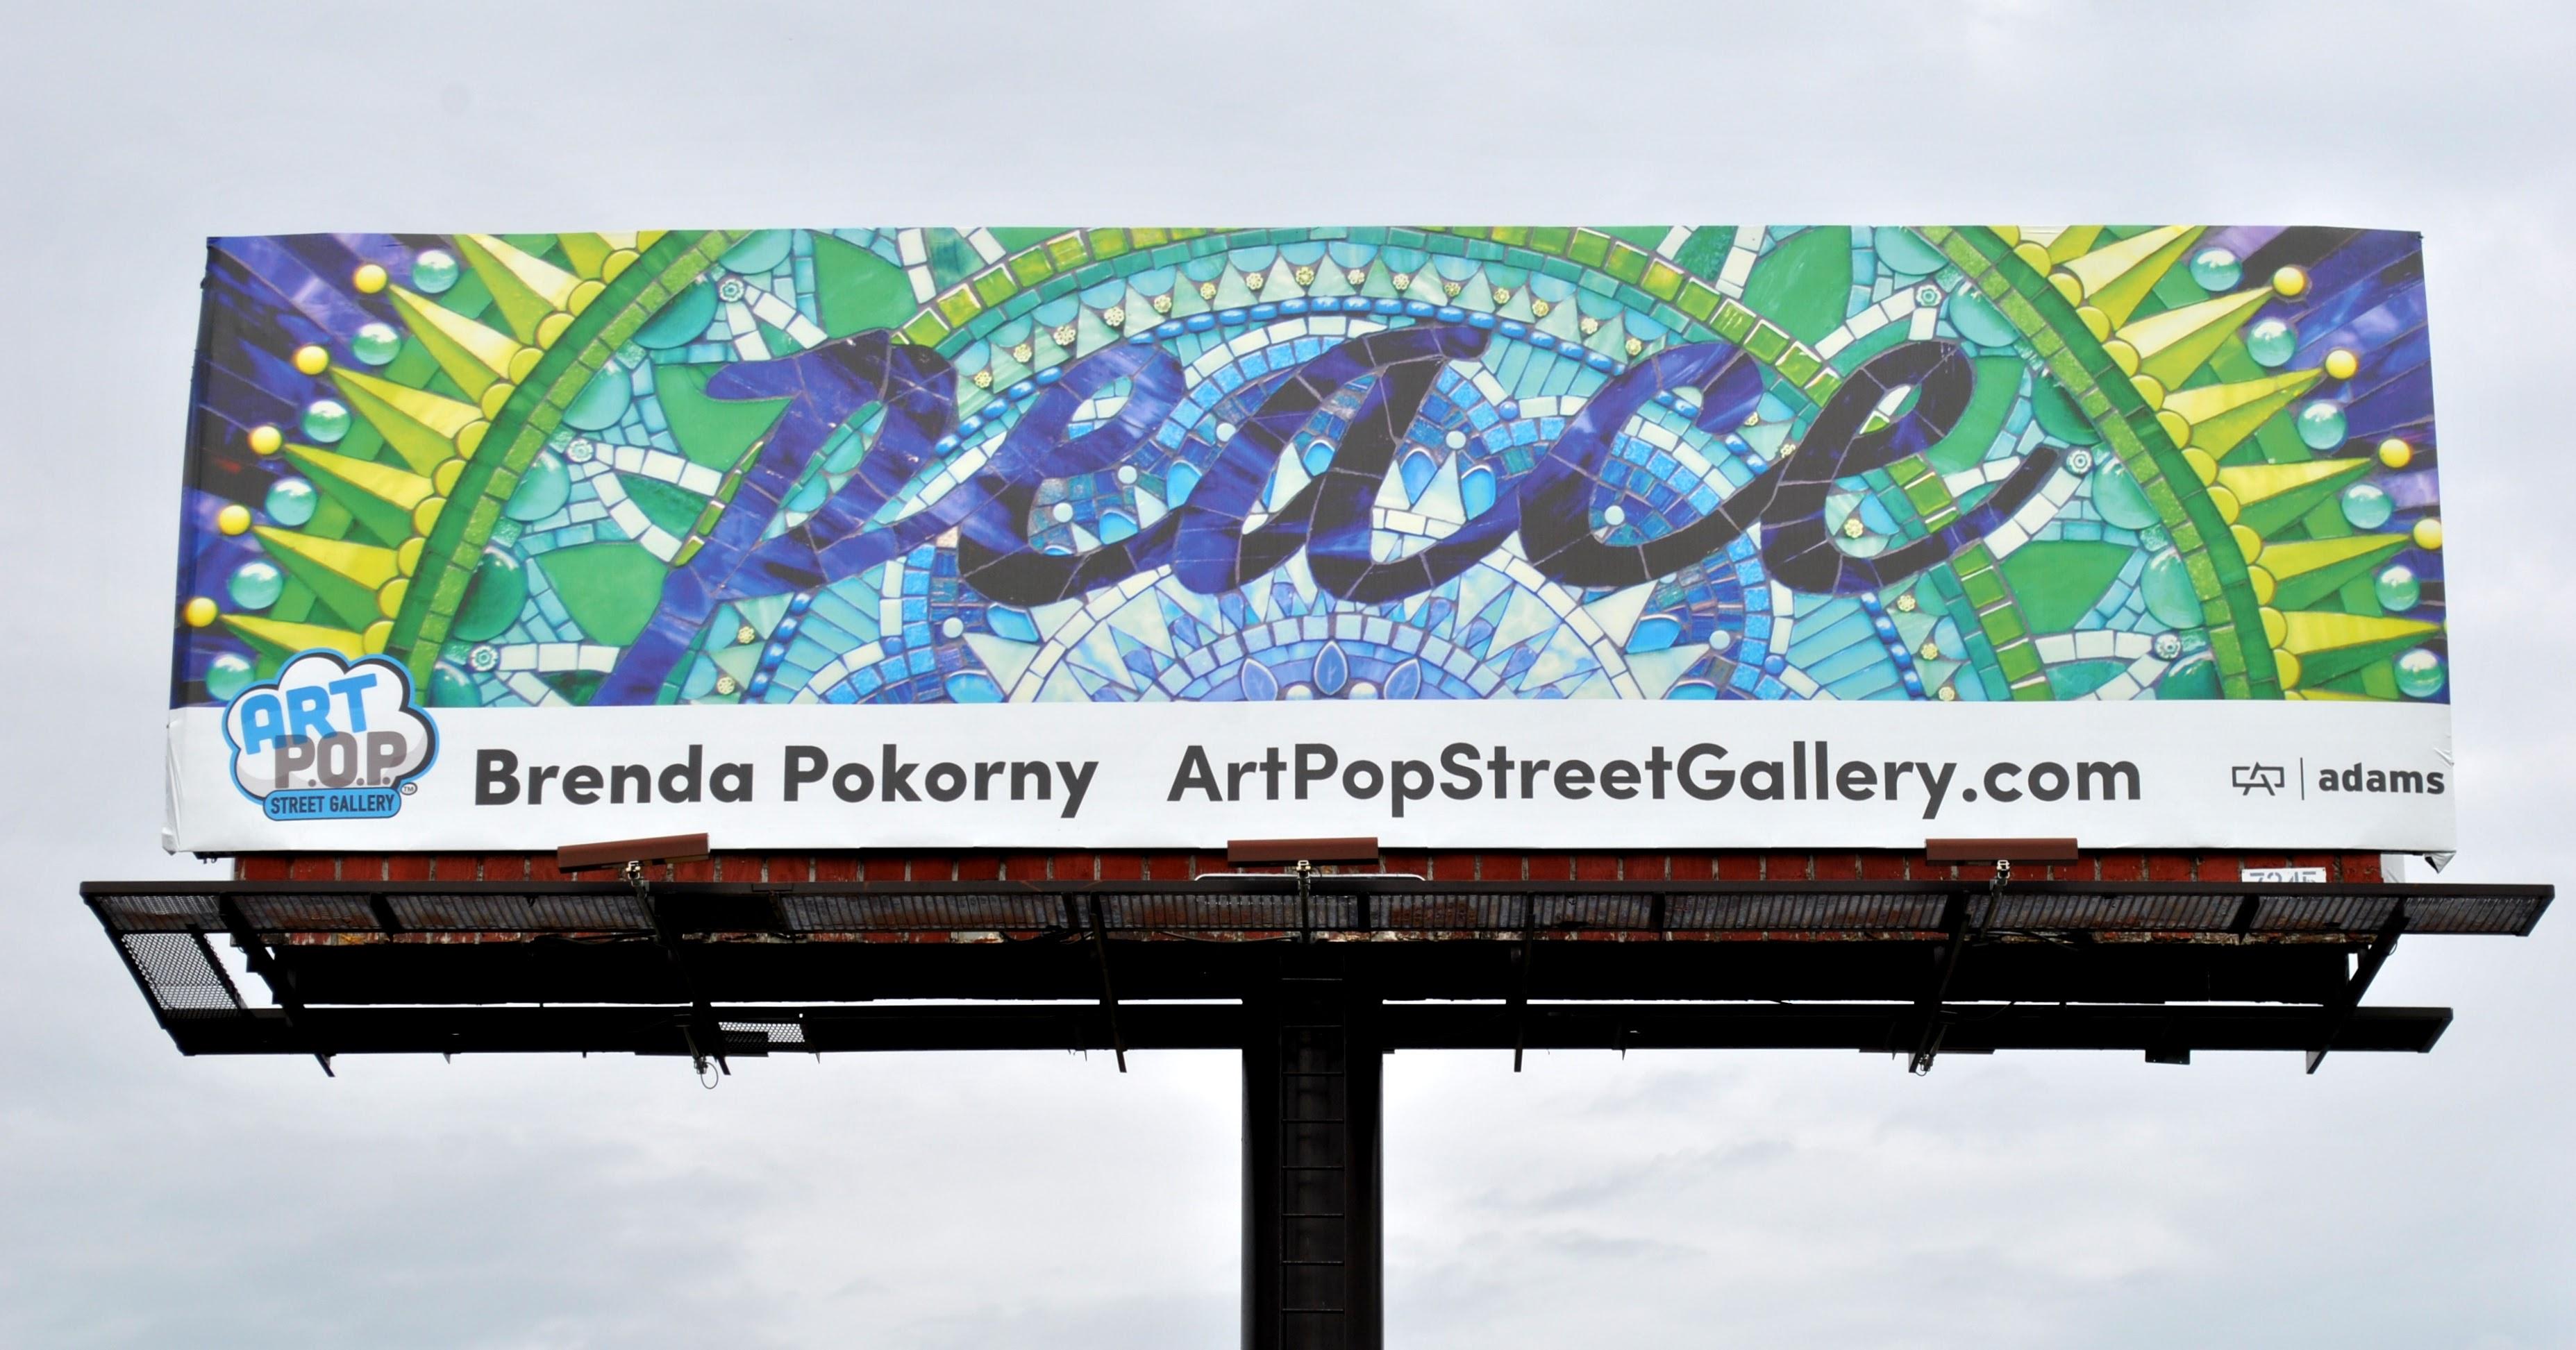 https://www.brendapokornymosaics.com/artpop-street-gallery